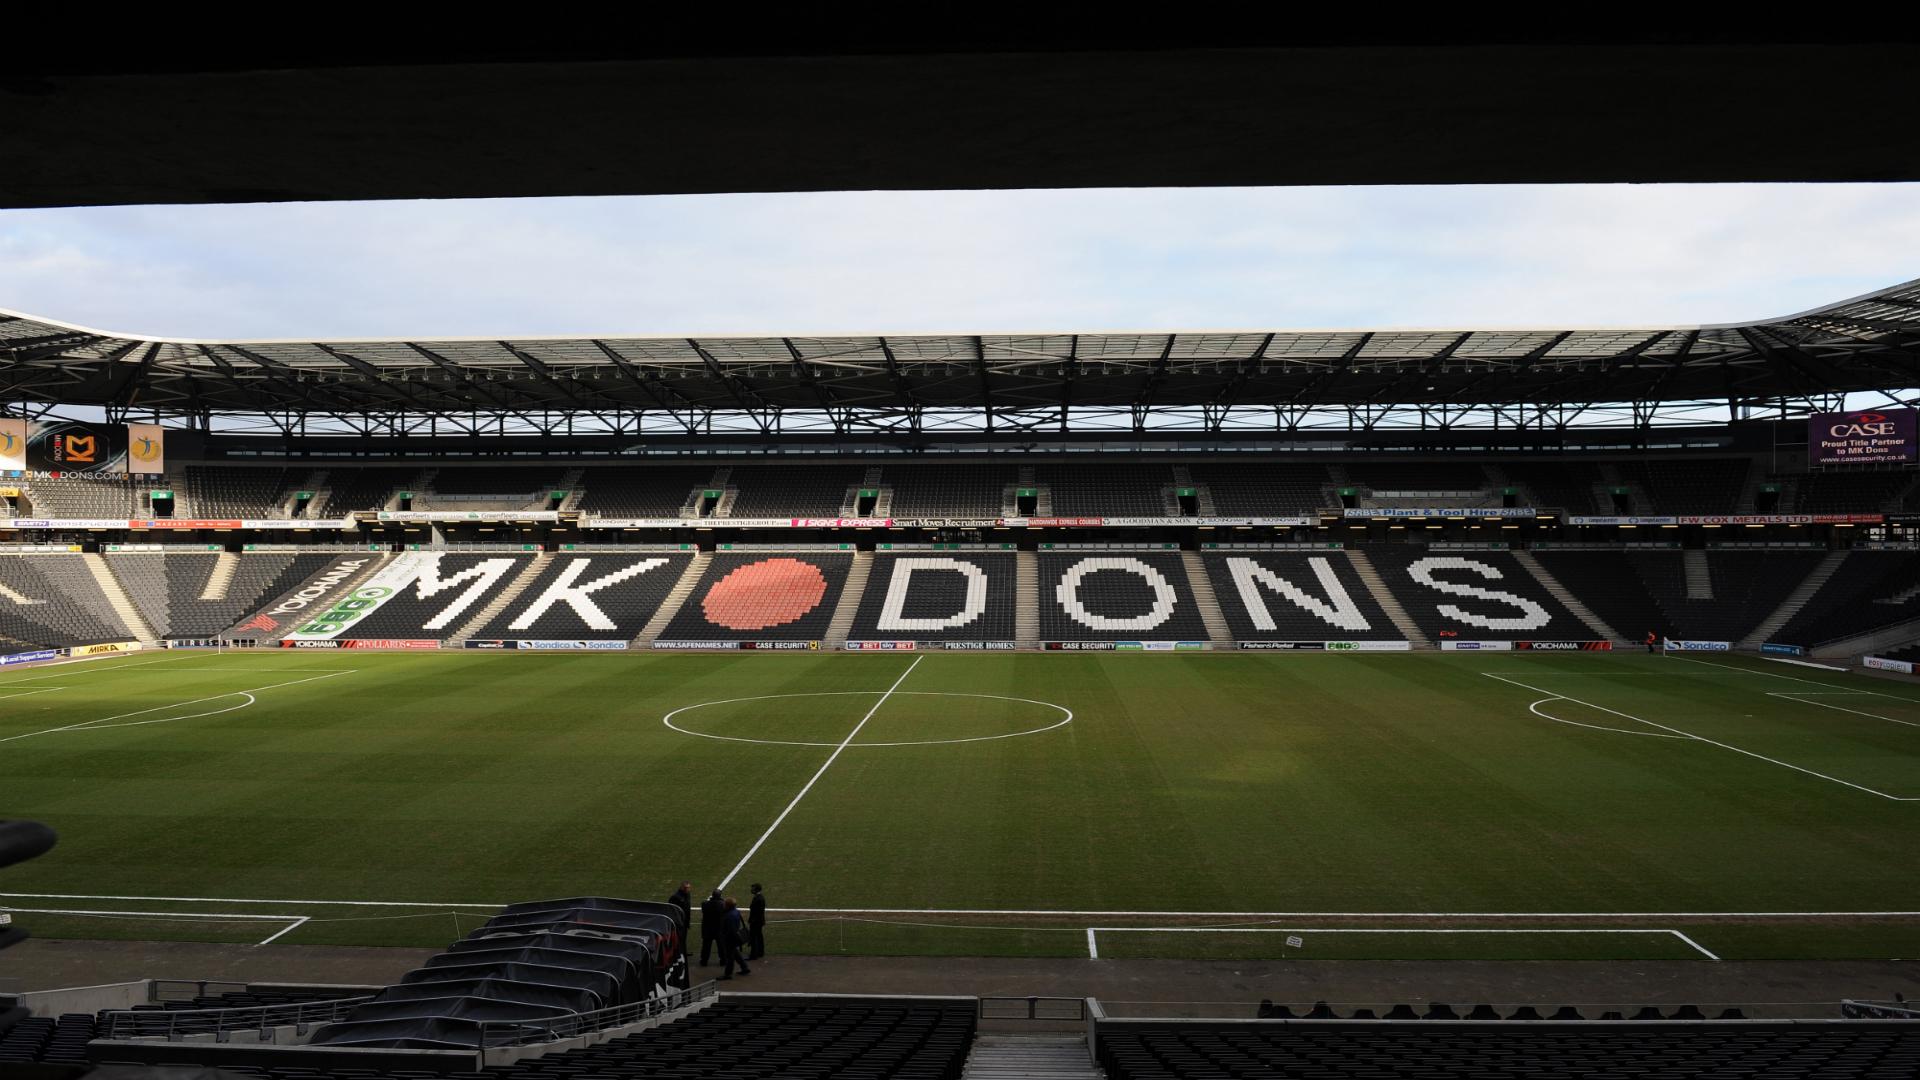 stadium mk MK Dons League One